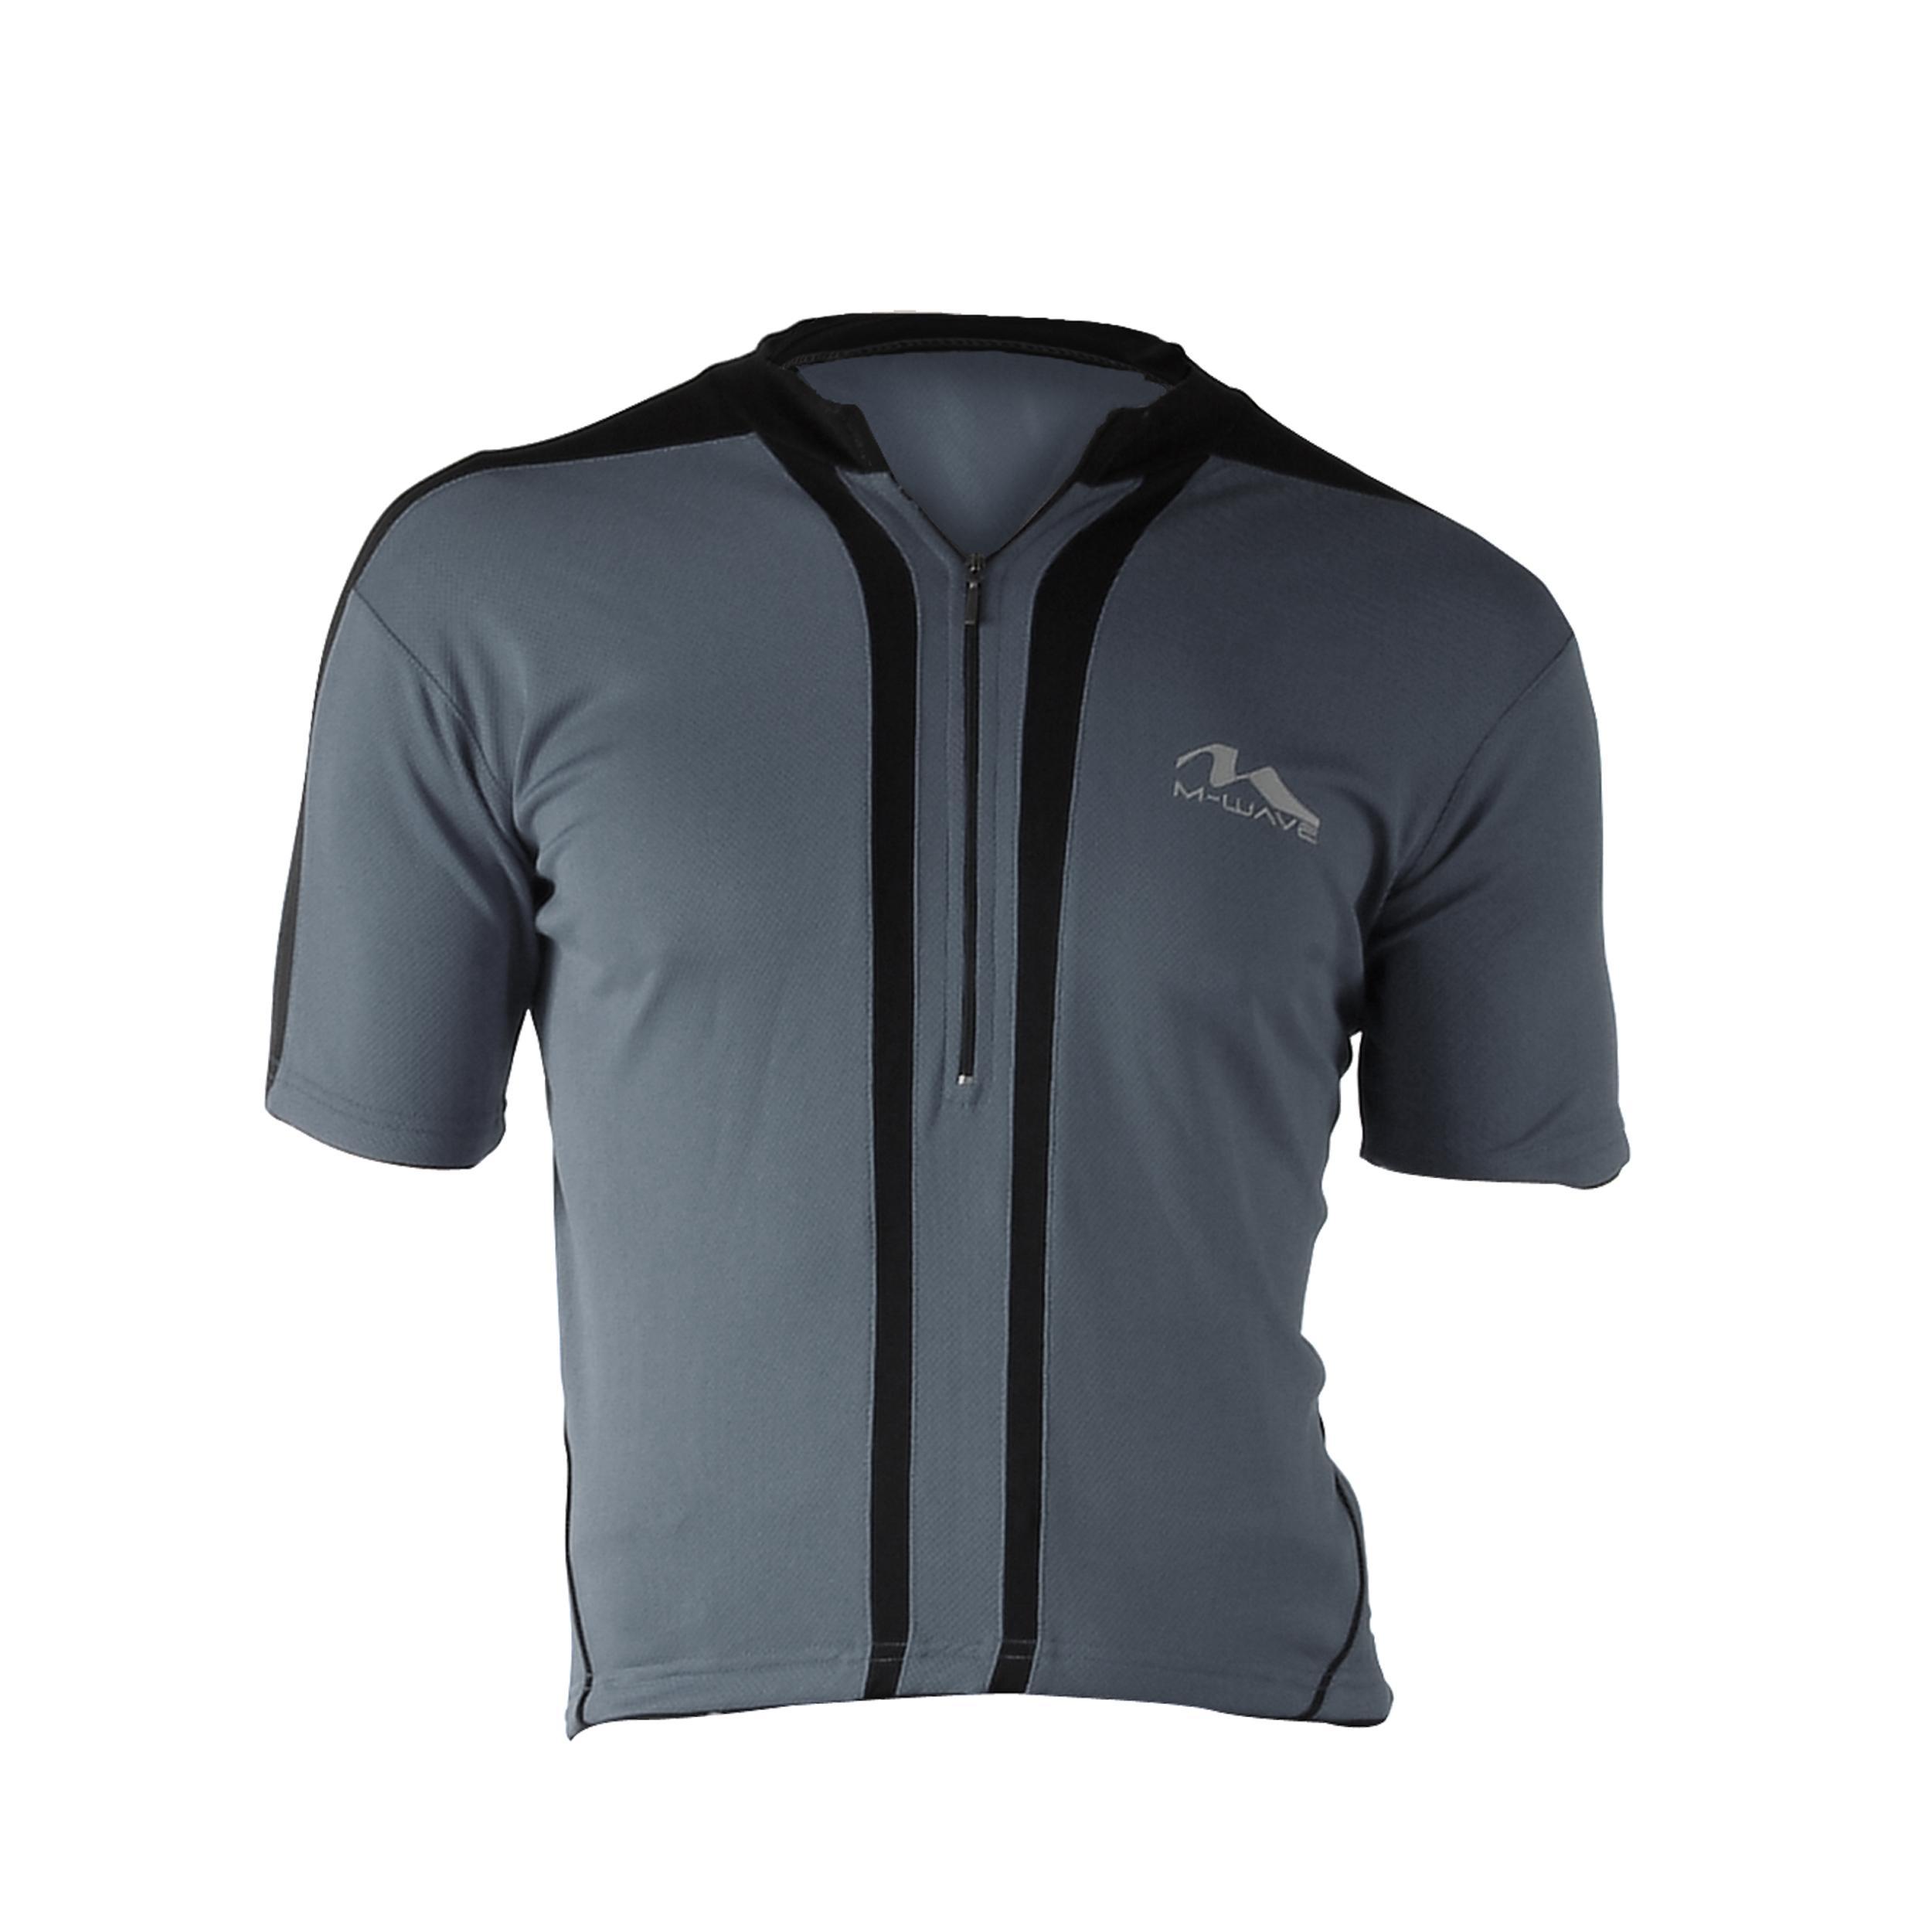 Cycle Force Men's M-Wave Dark Grey Bicycle Jersey (Large)